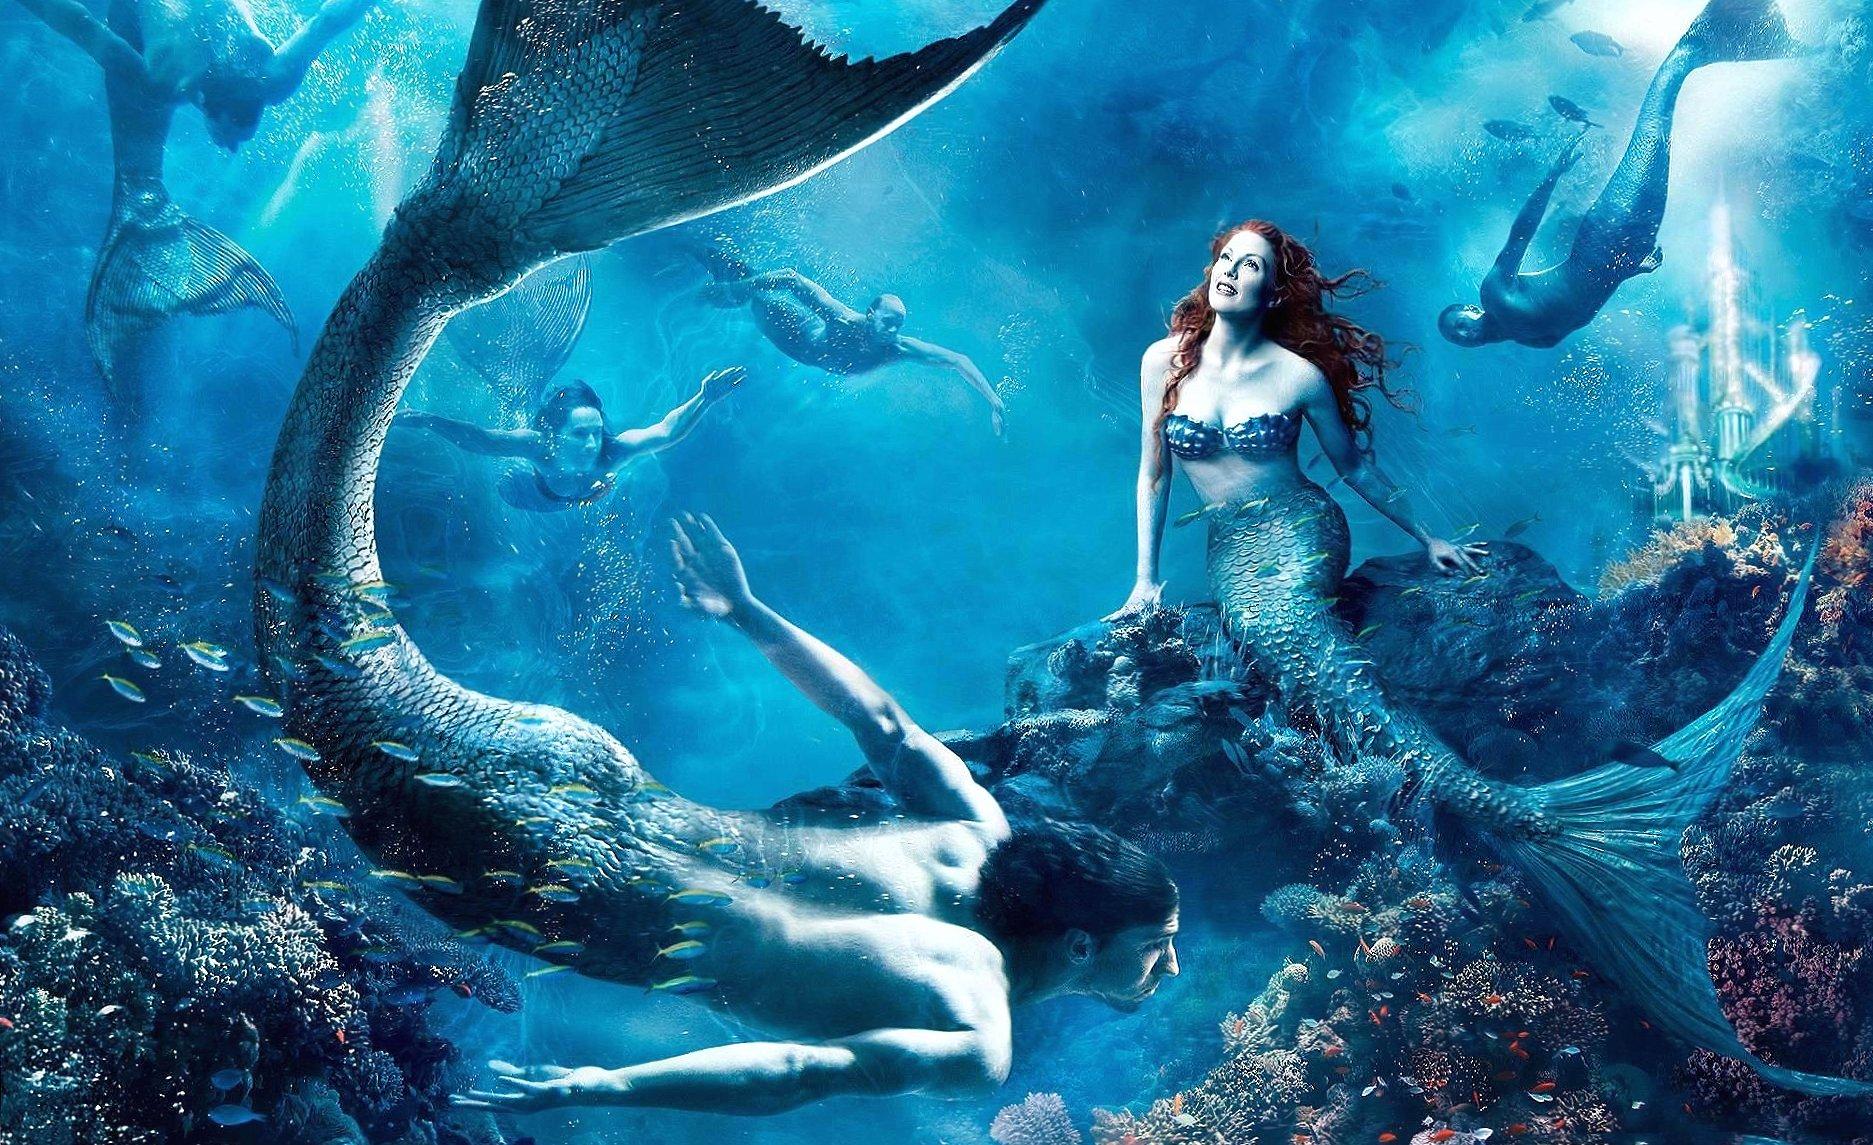 Mermaid city wallpapers HD quality